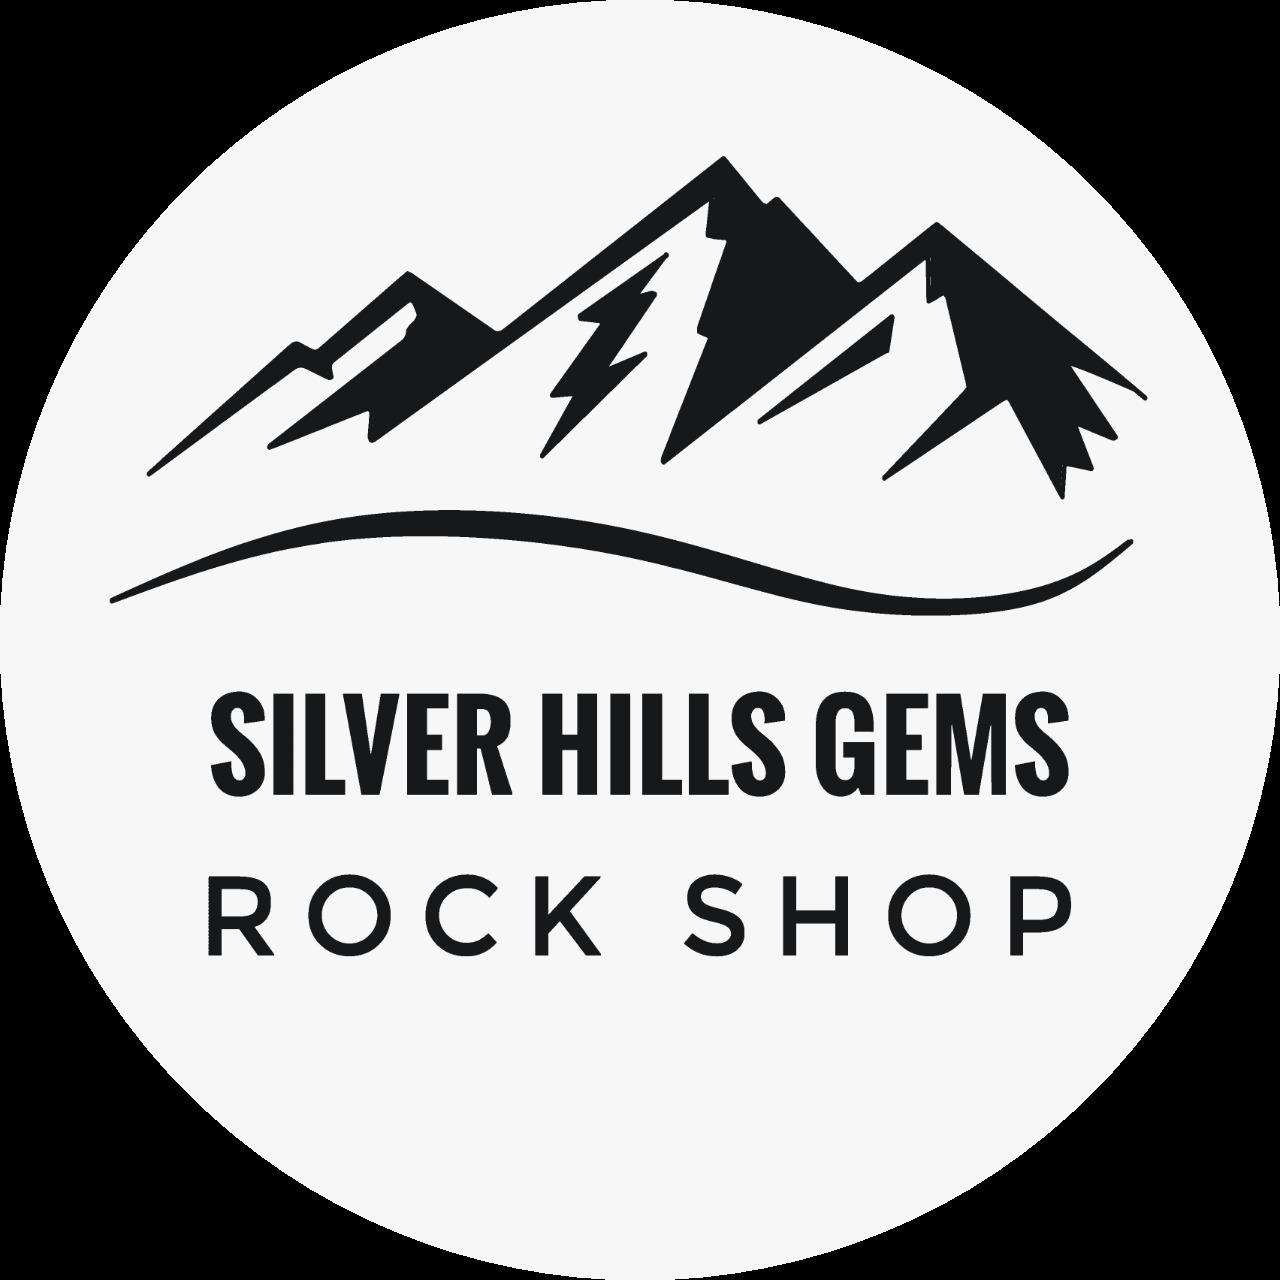 Silver Hills Gems